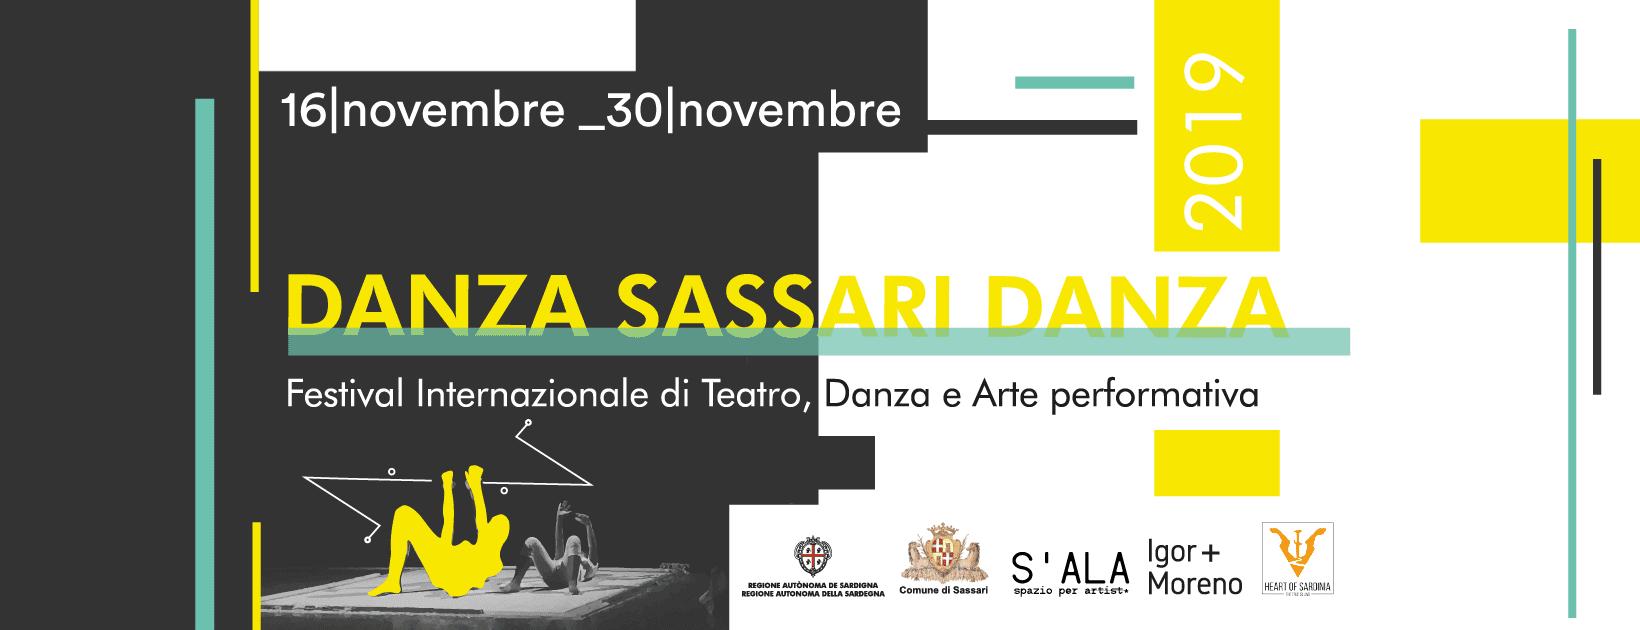 Danza Sassari Danza Copertina